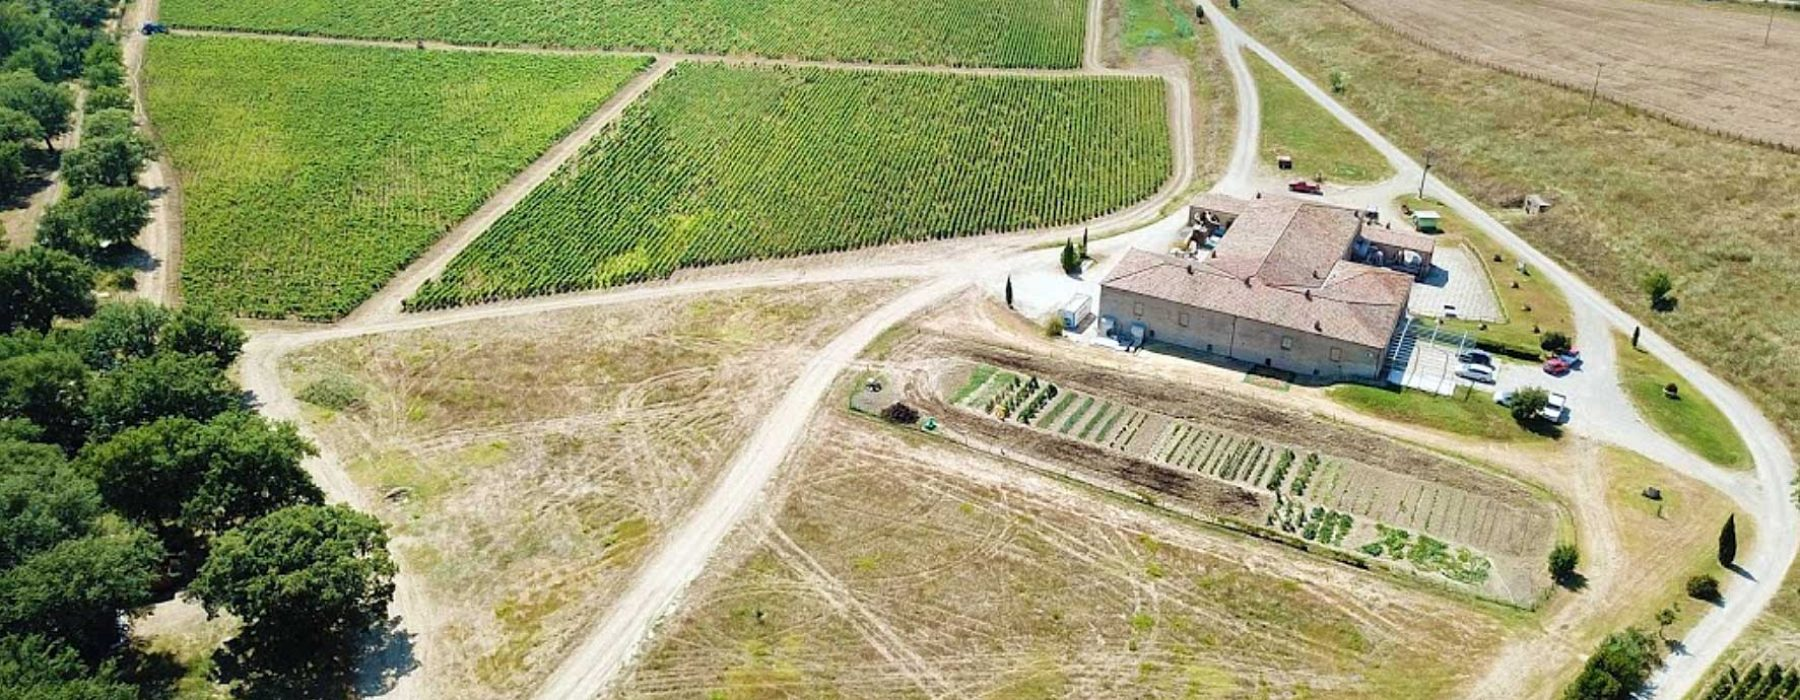 Trinoro e Passopisciaro: 從托斯卡納到西西里島的成功葡萄酒